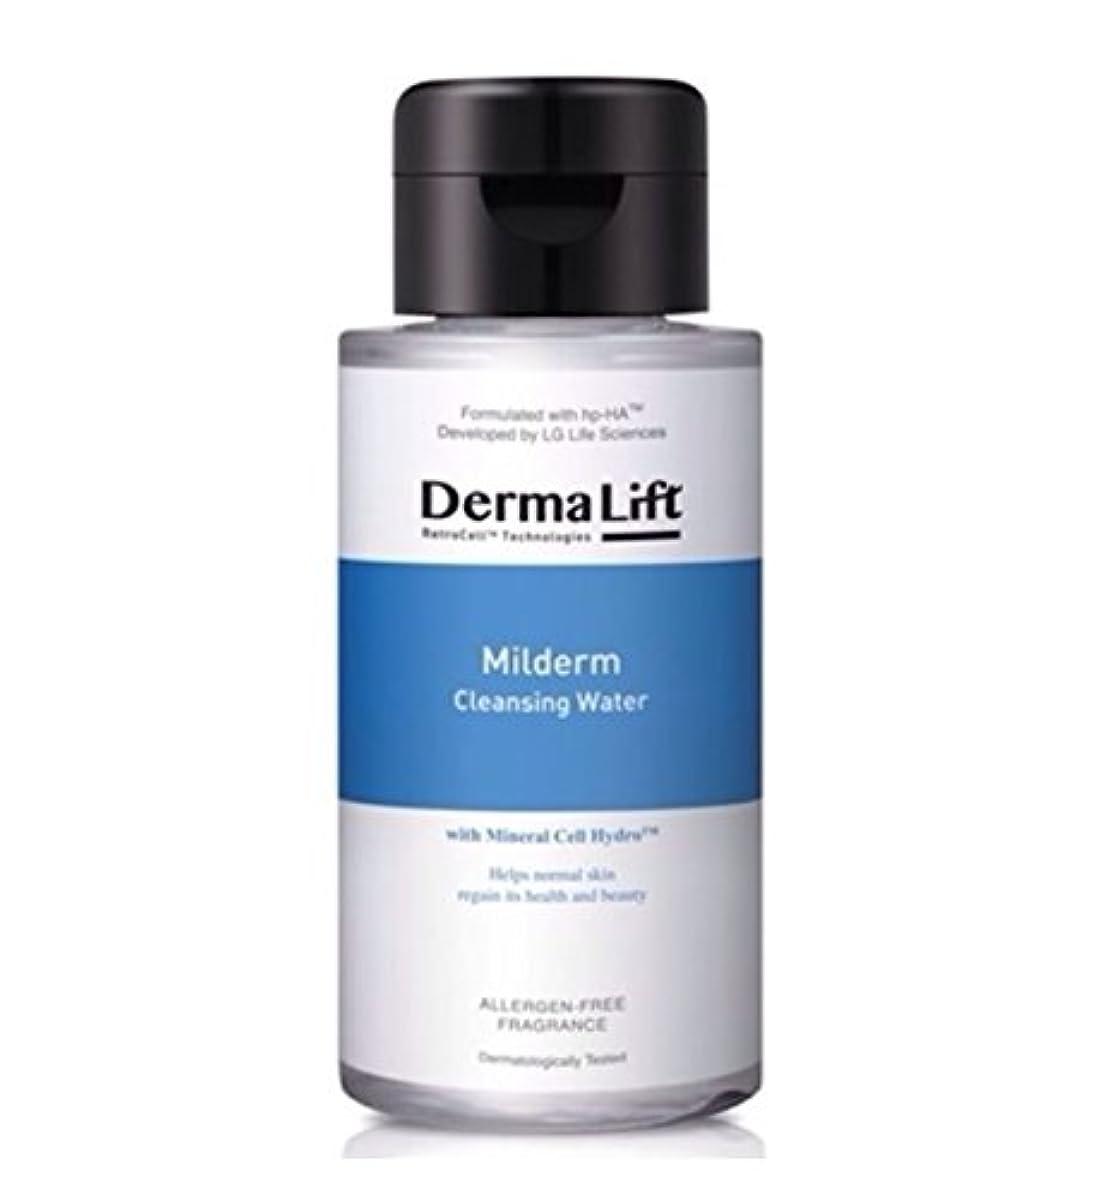 Derma Lift ダーマリフトマイルおまけクレンジングウォーター 300ml / Derma Lift MILDERM CLEANSING WATER 300ml [海外直送品]